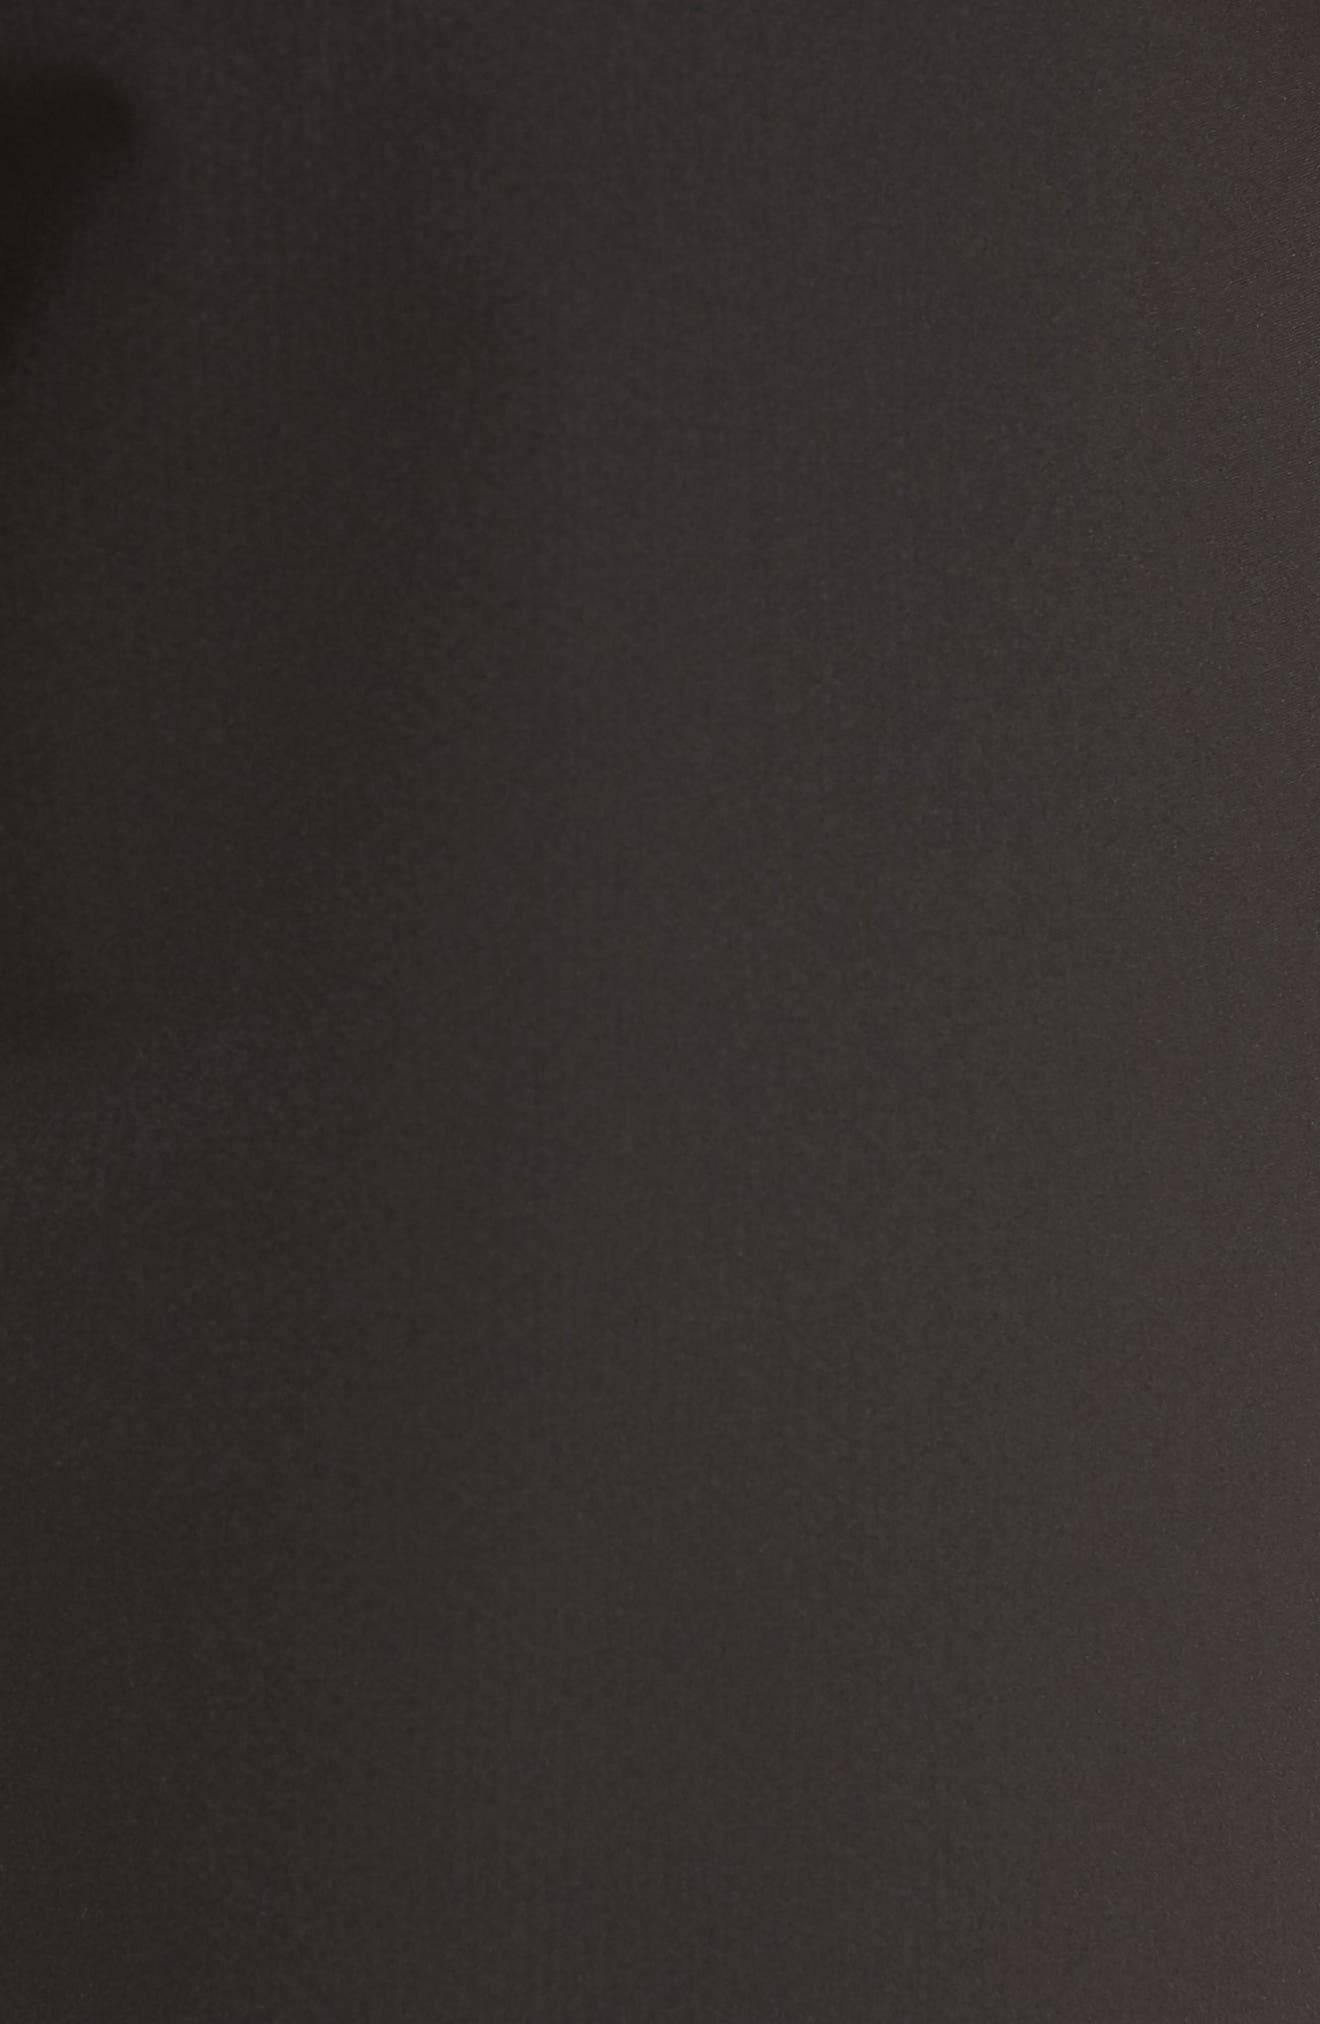 SNT Dry Hybrid Shorts,                             Alternate thumbnail 5, color,                             Black